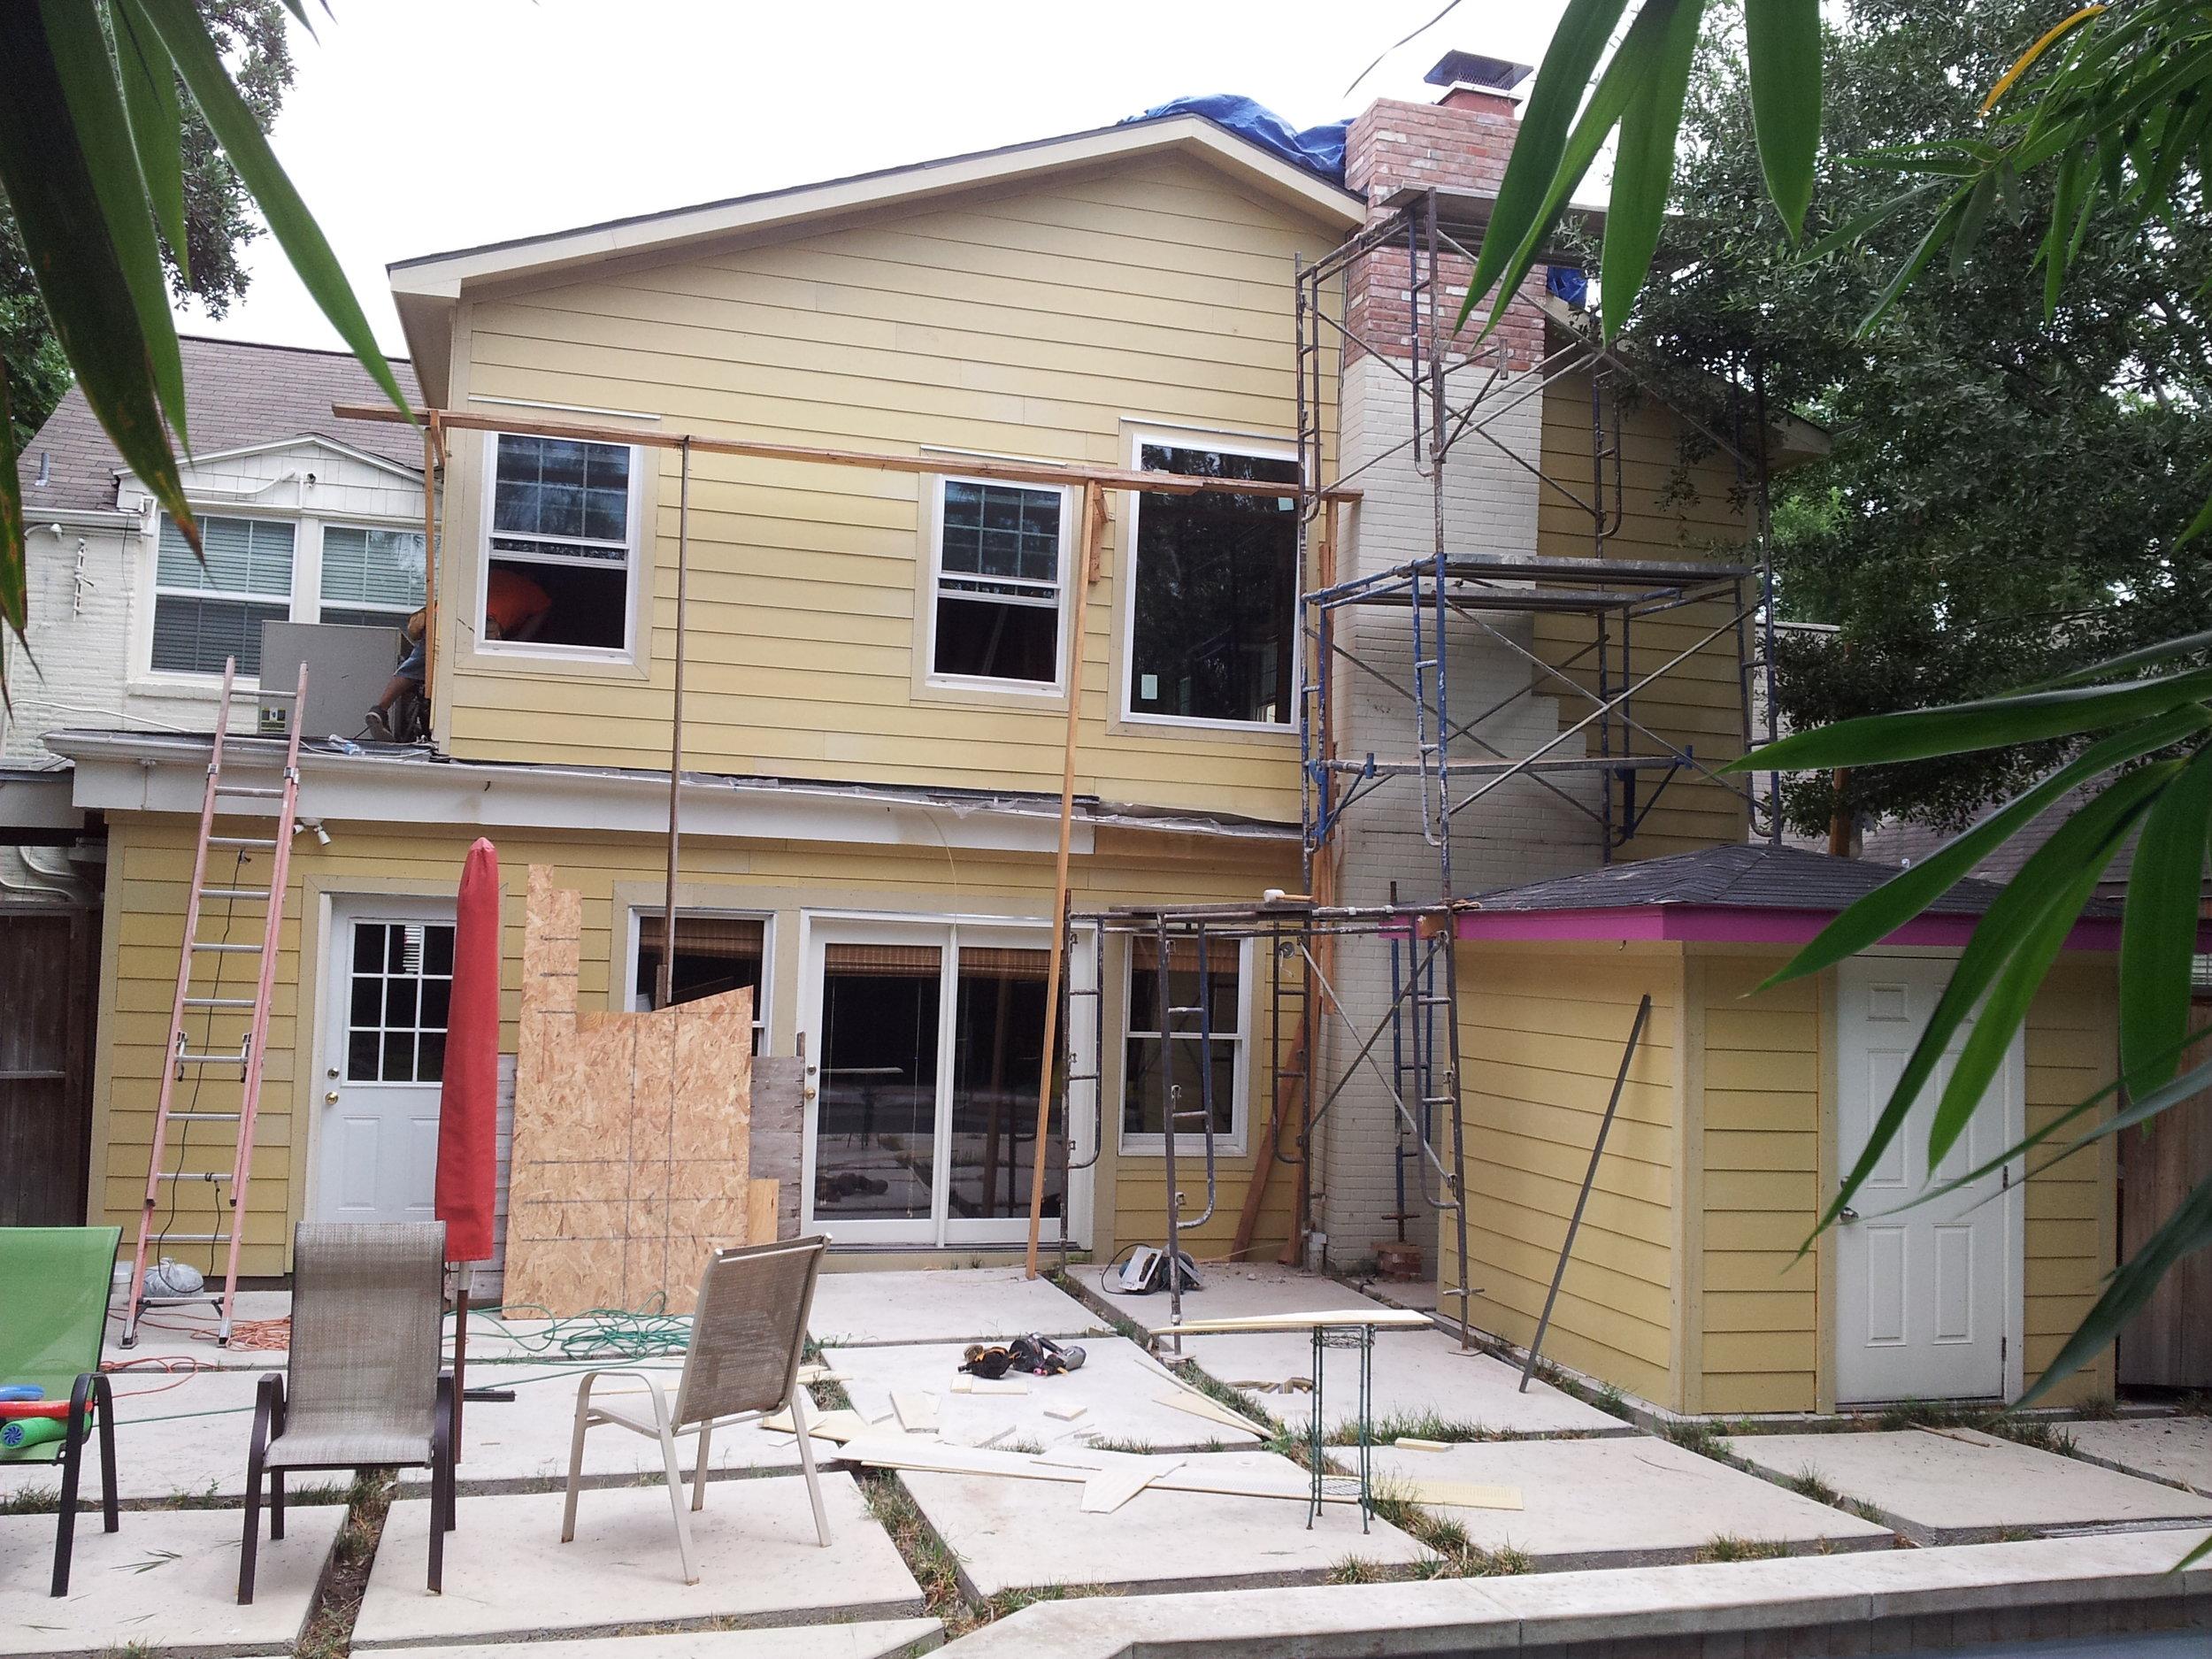 2013 construction progress and original casita.jpg